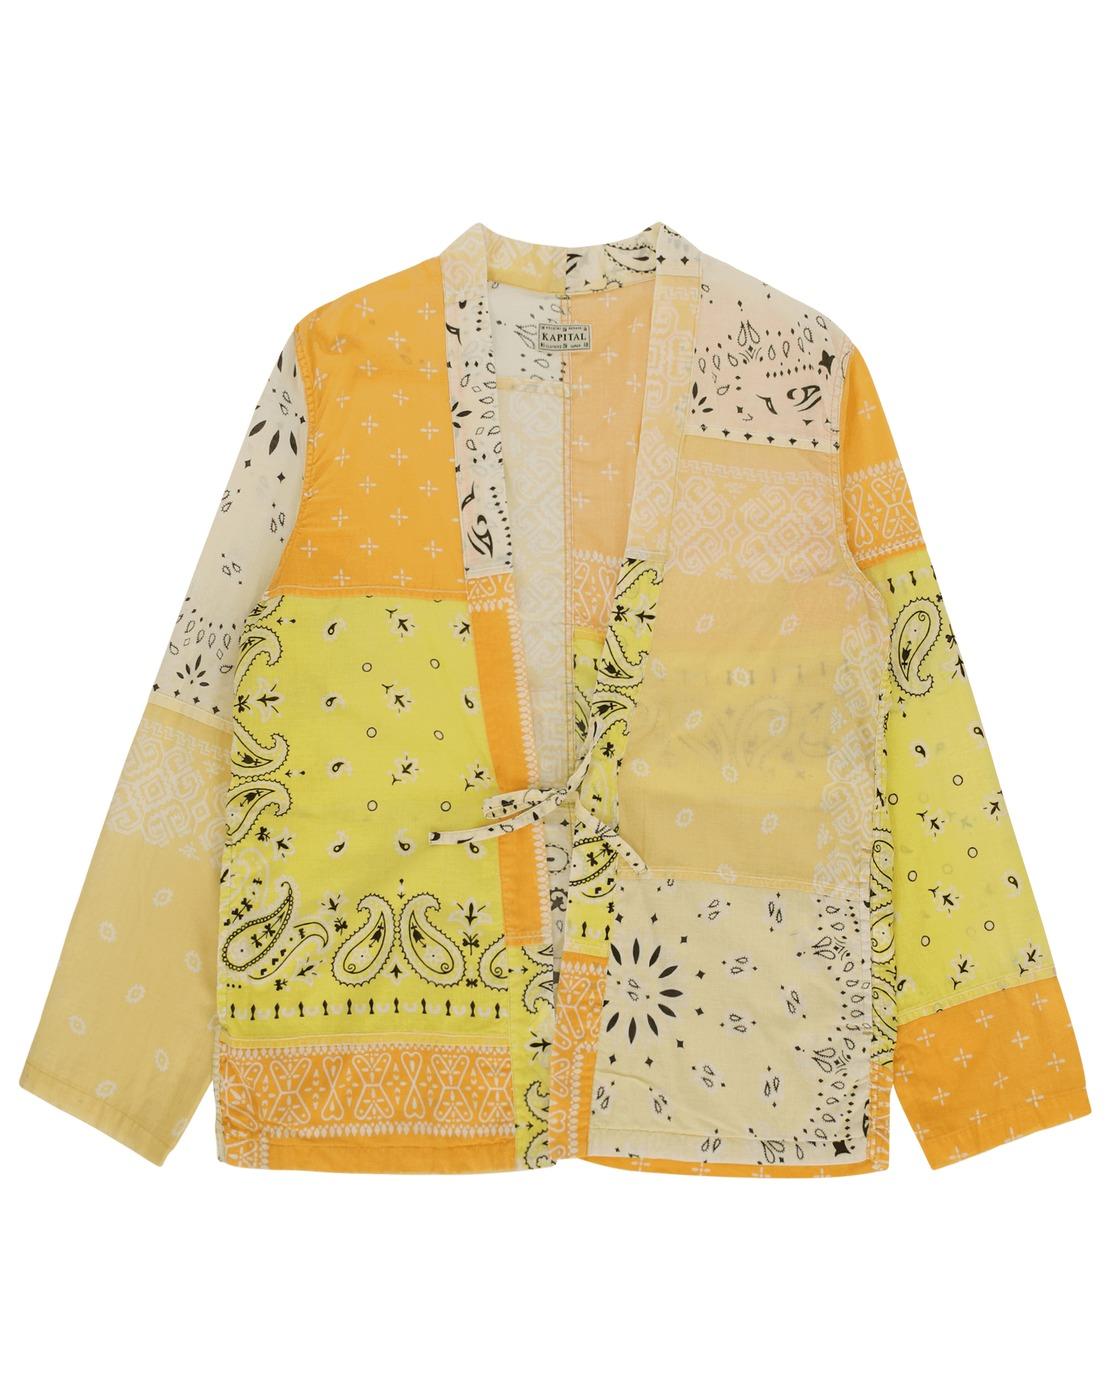 Kapital Gauze Bandana Patchwork Kakashi Shirt Yellow